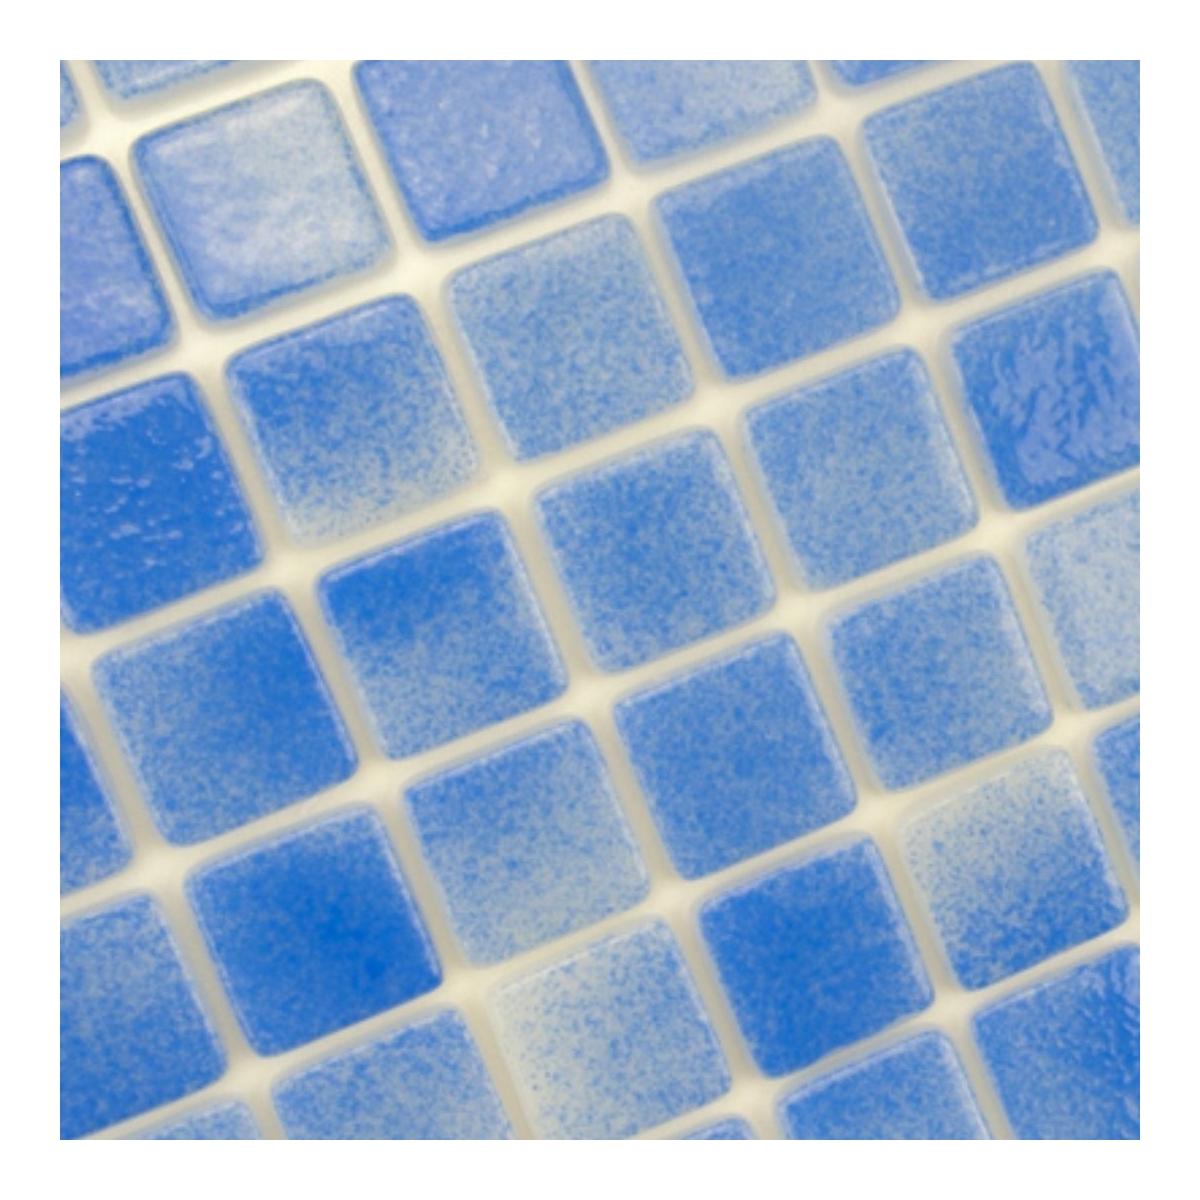 Glass Mosaic Reviglass PS-53 2.5 x 2.5 cm